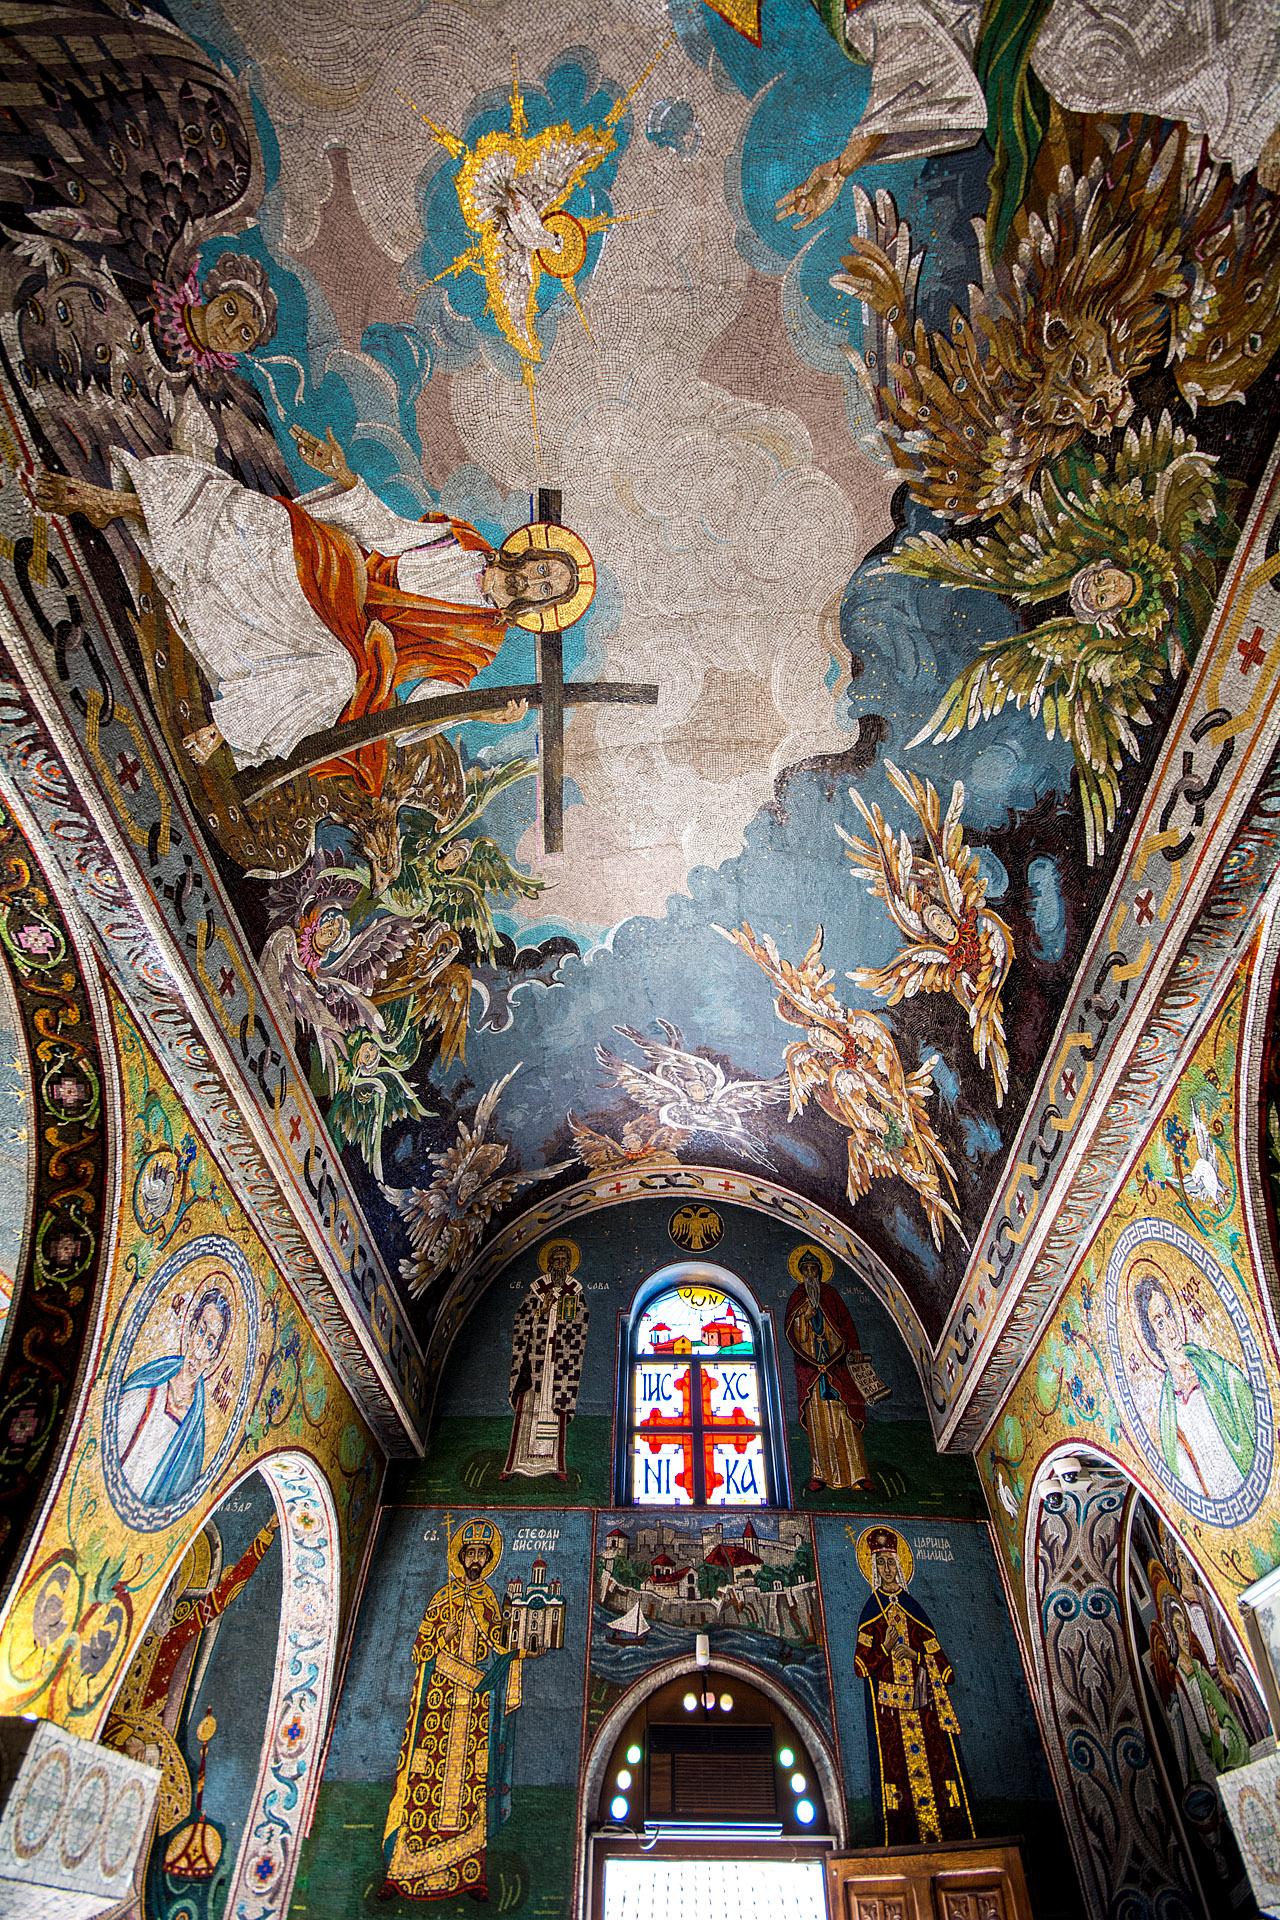 St. Petka's Chapel (interior)